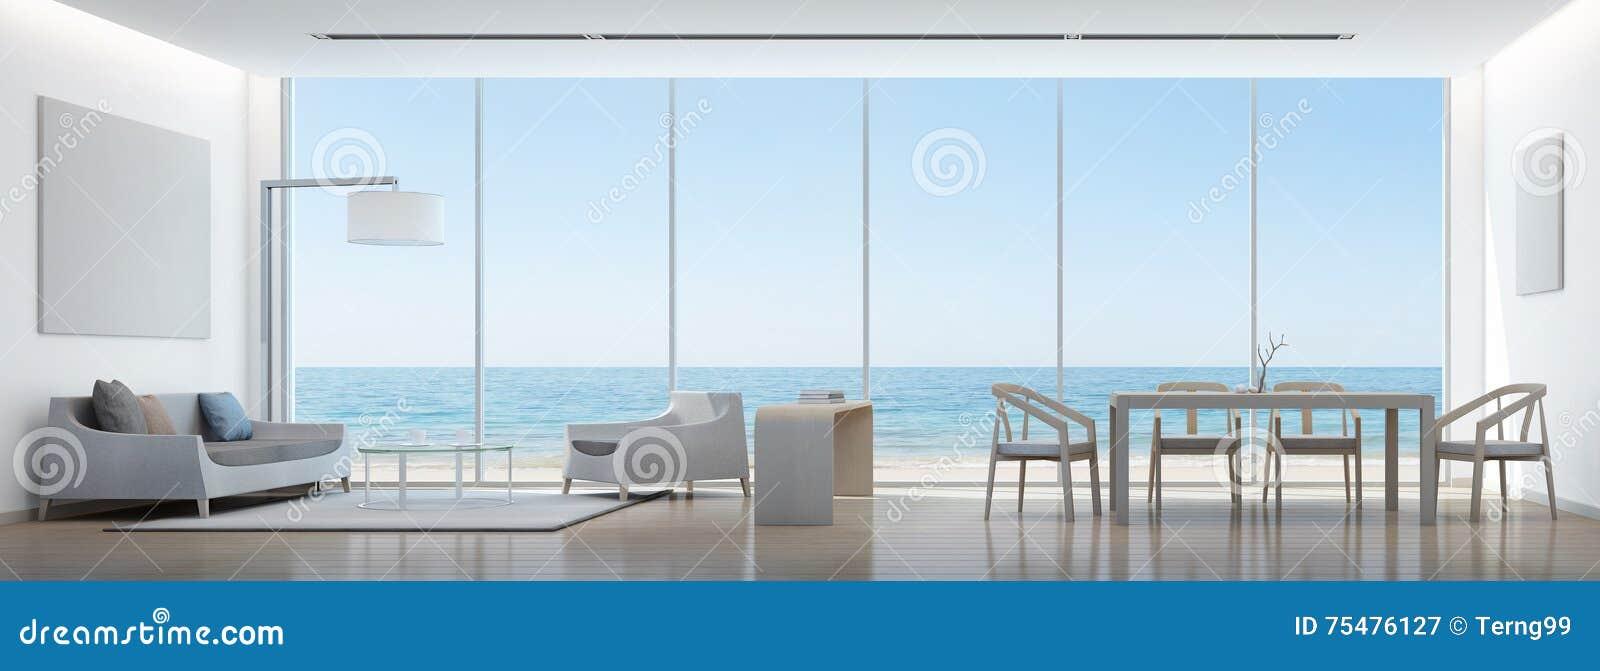 Salone e sala da pranzo di vista del mare in casa moderna for Casa moderna bianca